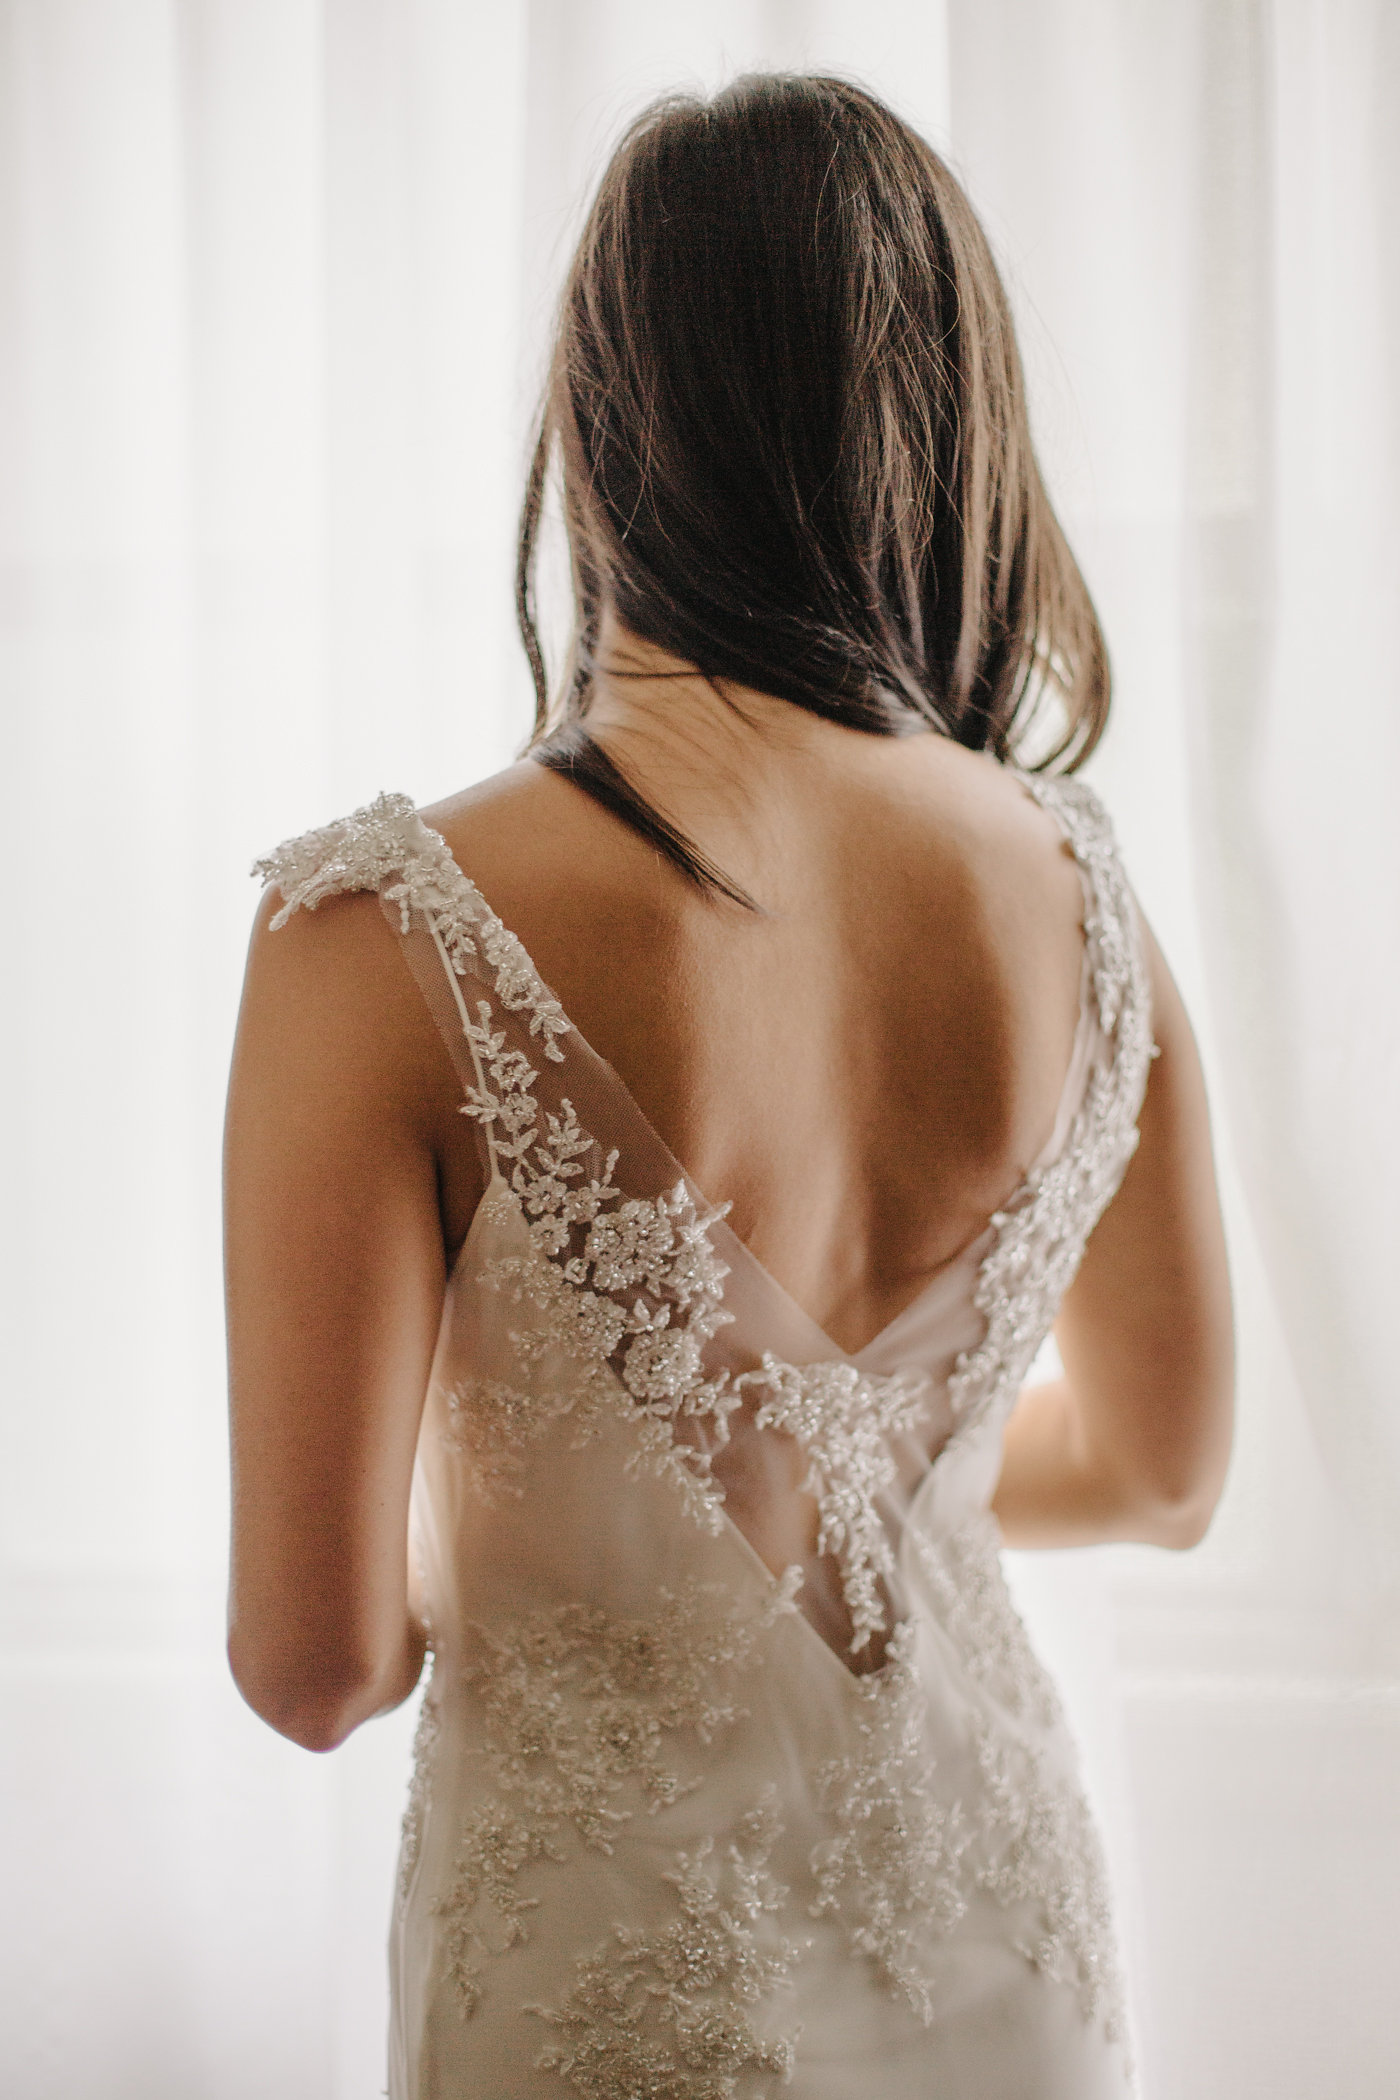 sarah janks wedding dresses photo - 1